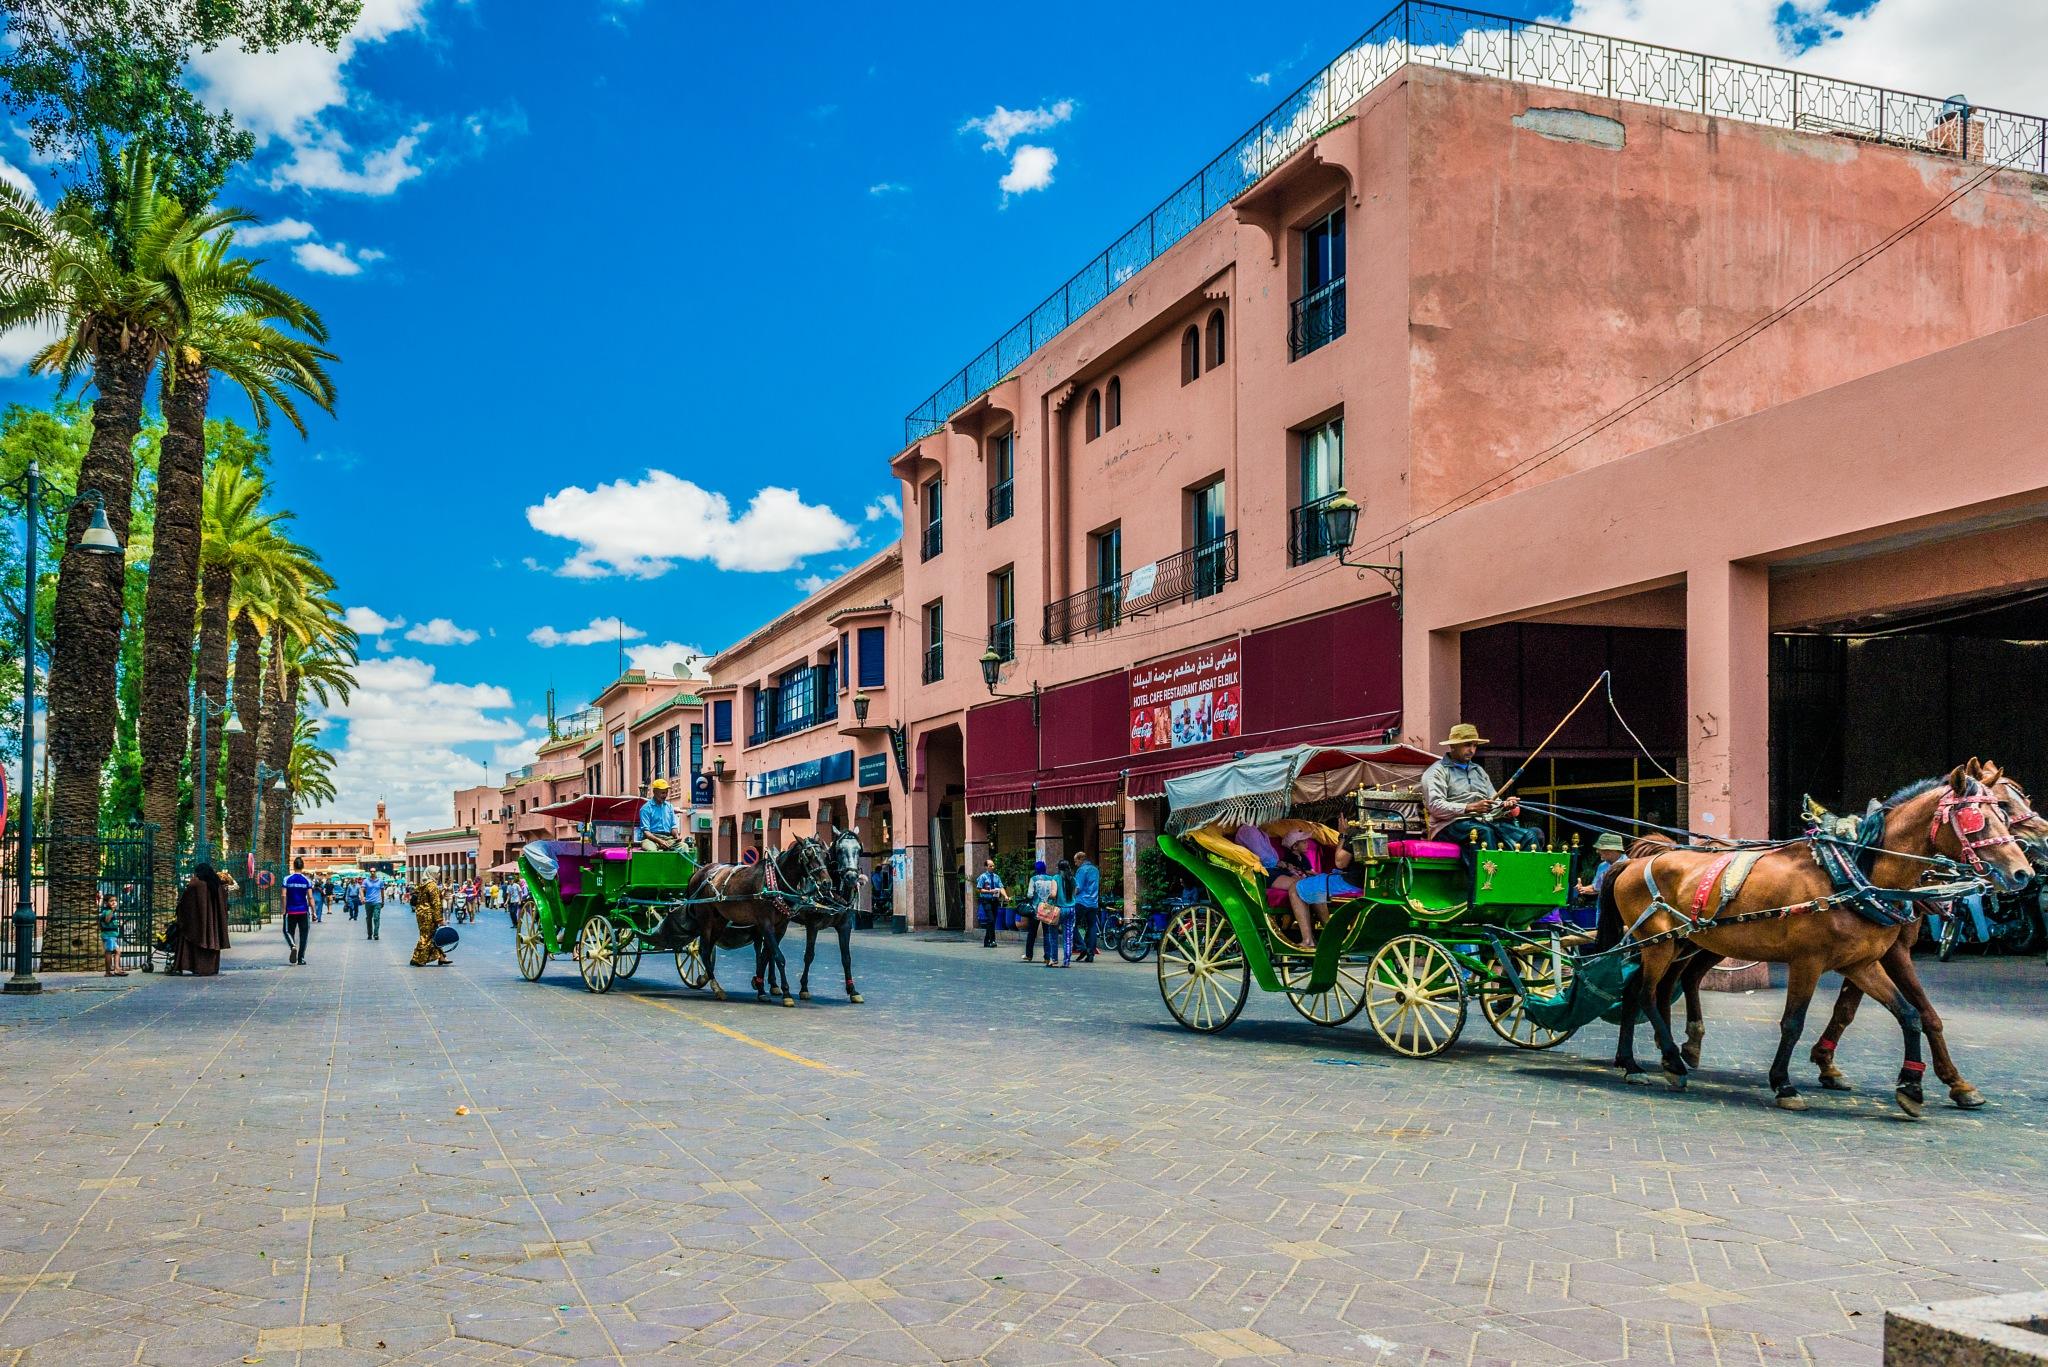 Marrakech Trip by KarimMaataoui